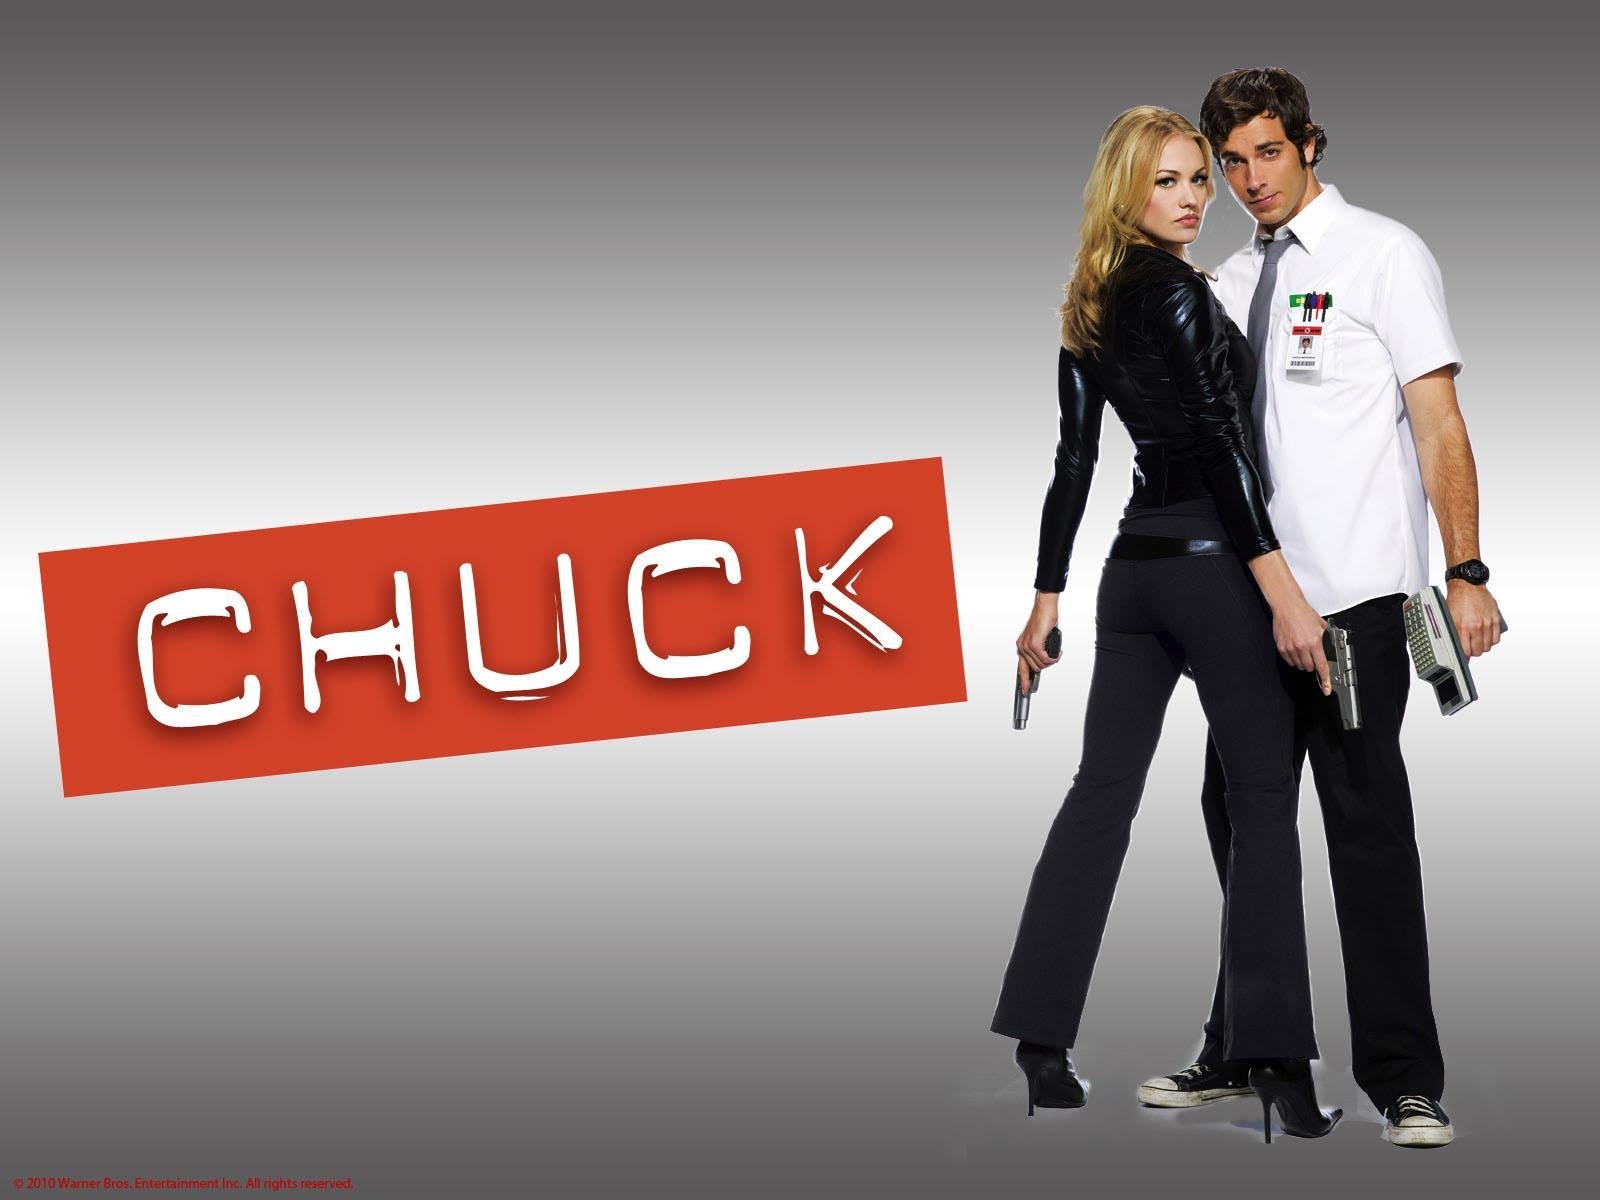 chuck versus the push mix